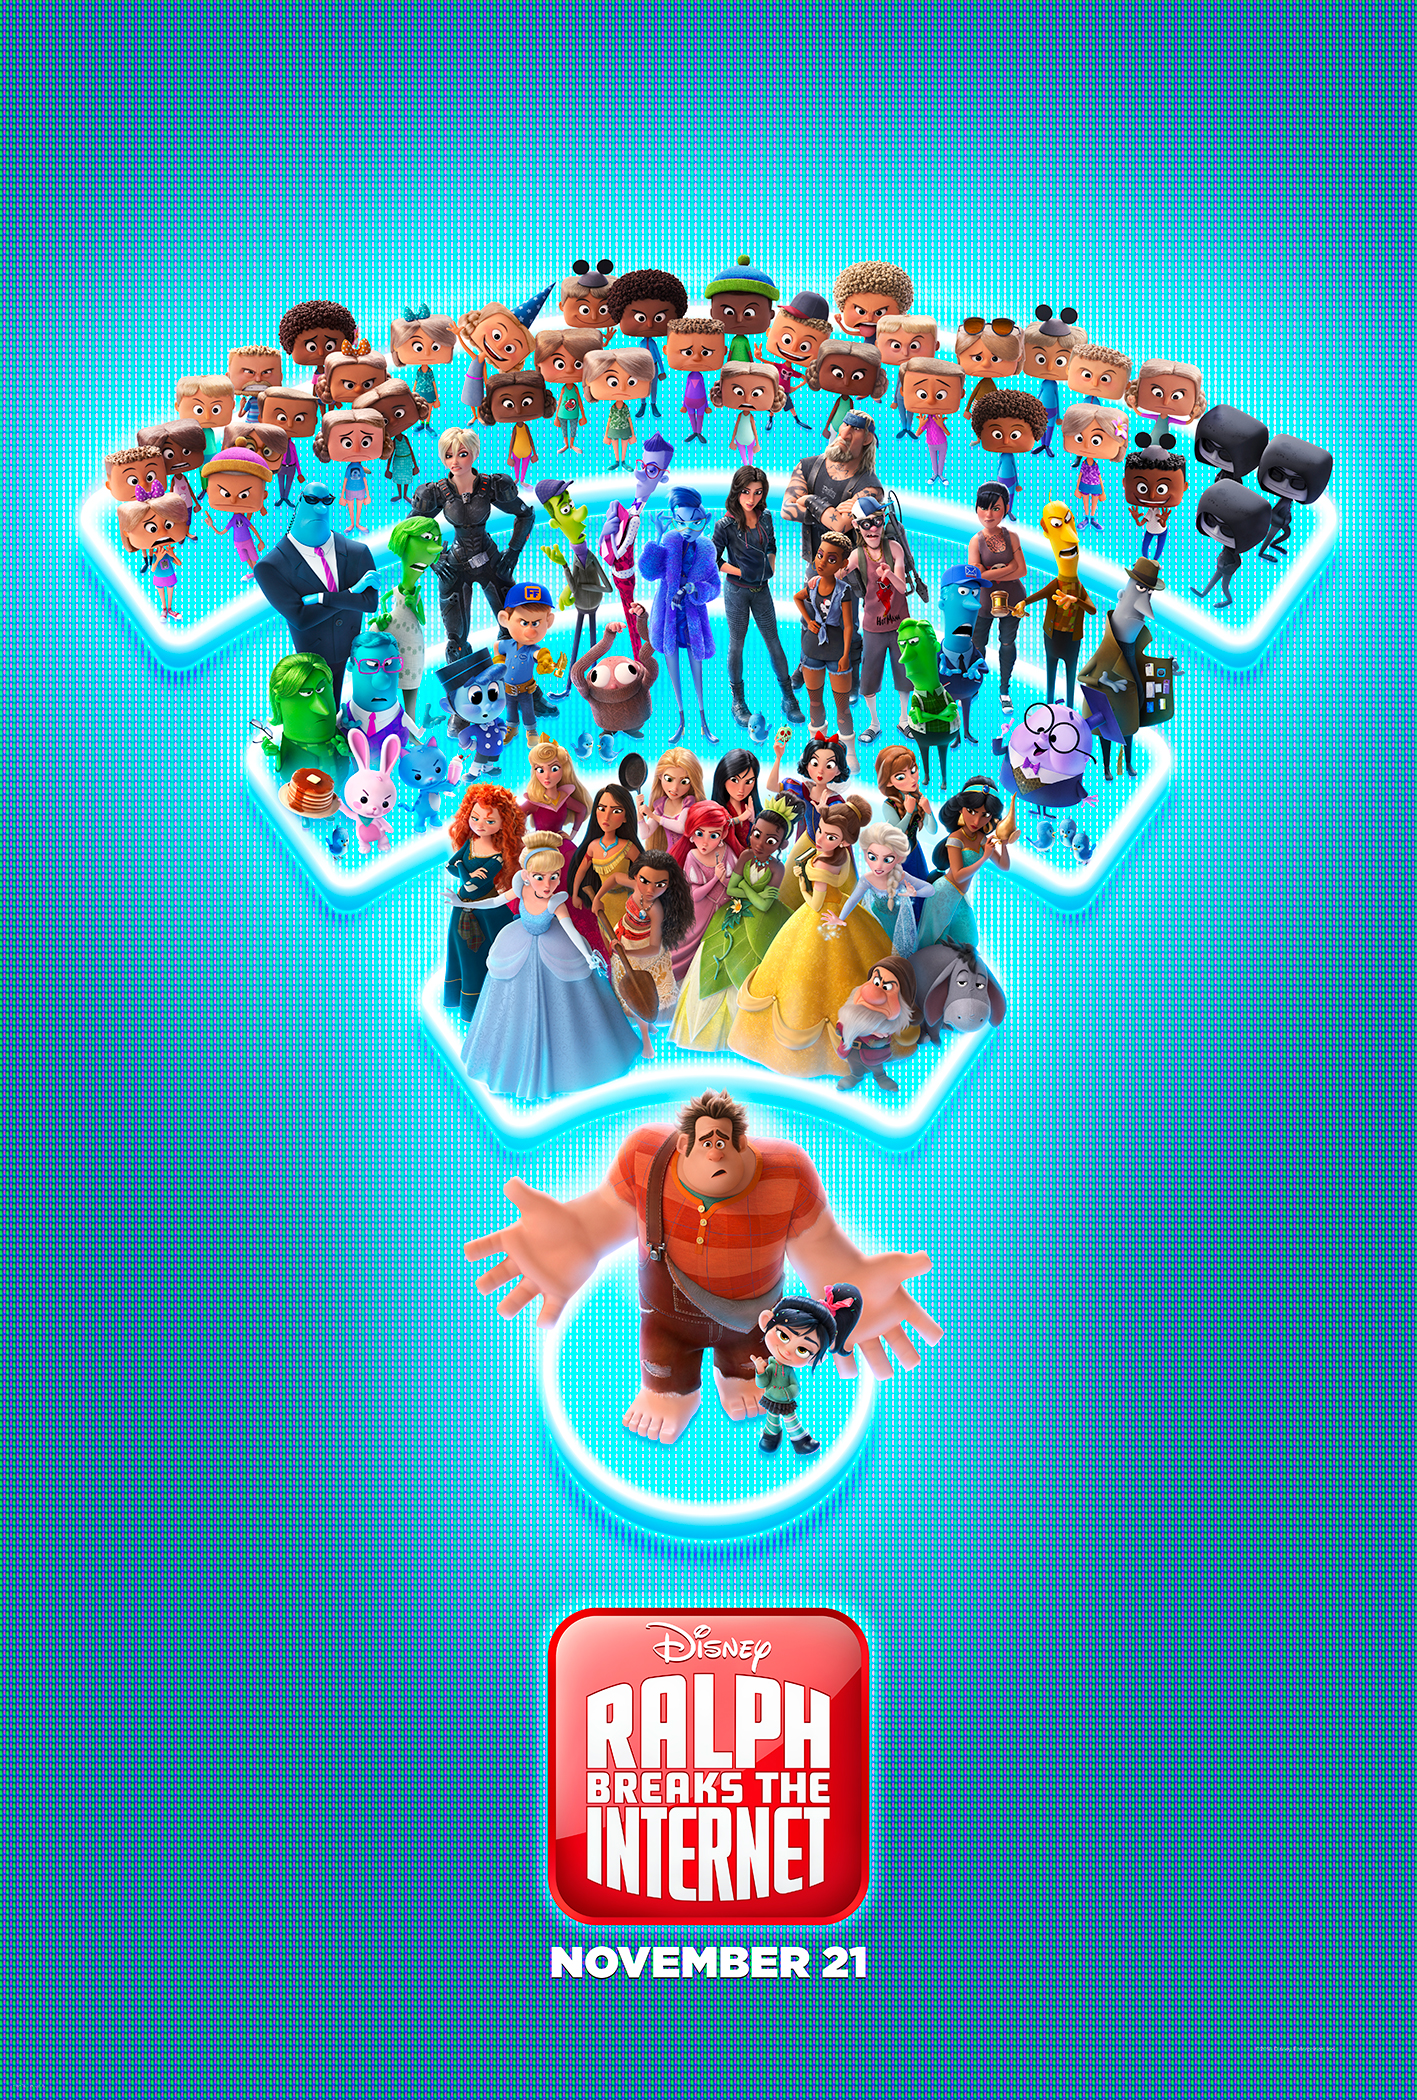 RALPH BREAKS THE INTERNET - Check out the New Trailer & Poster #RalphBreaksTheInternet